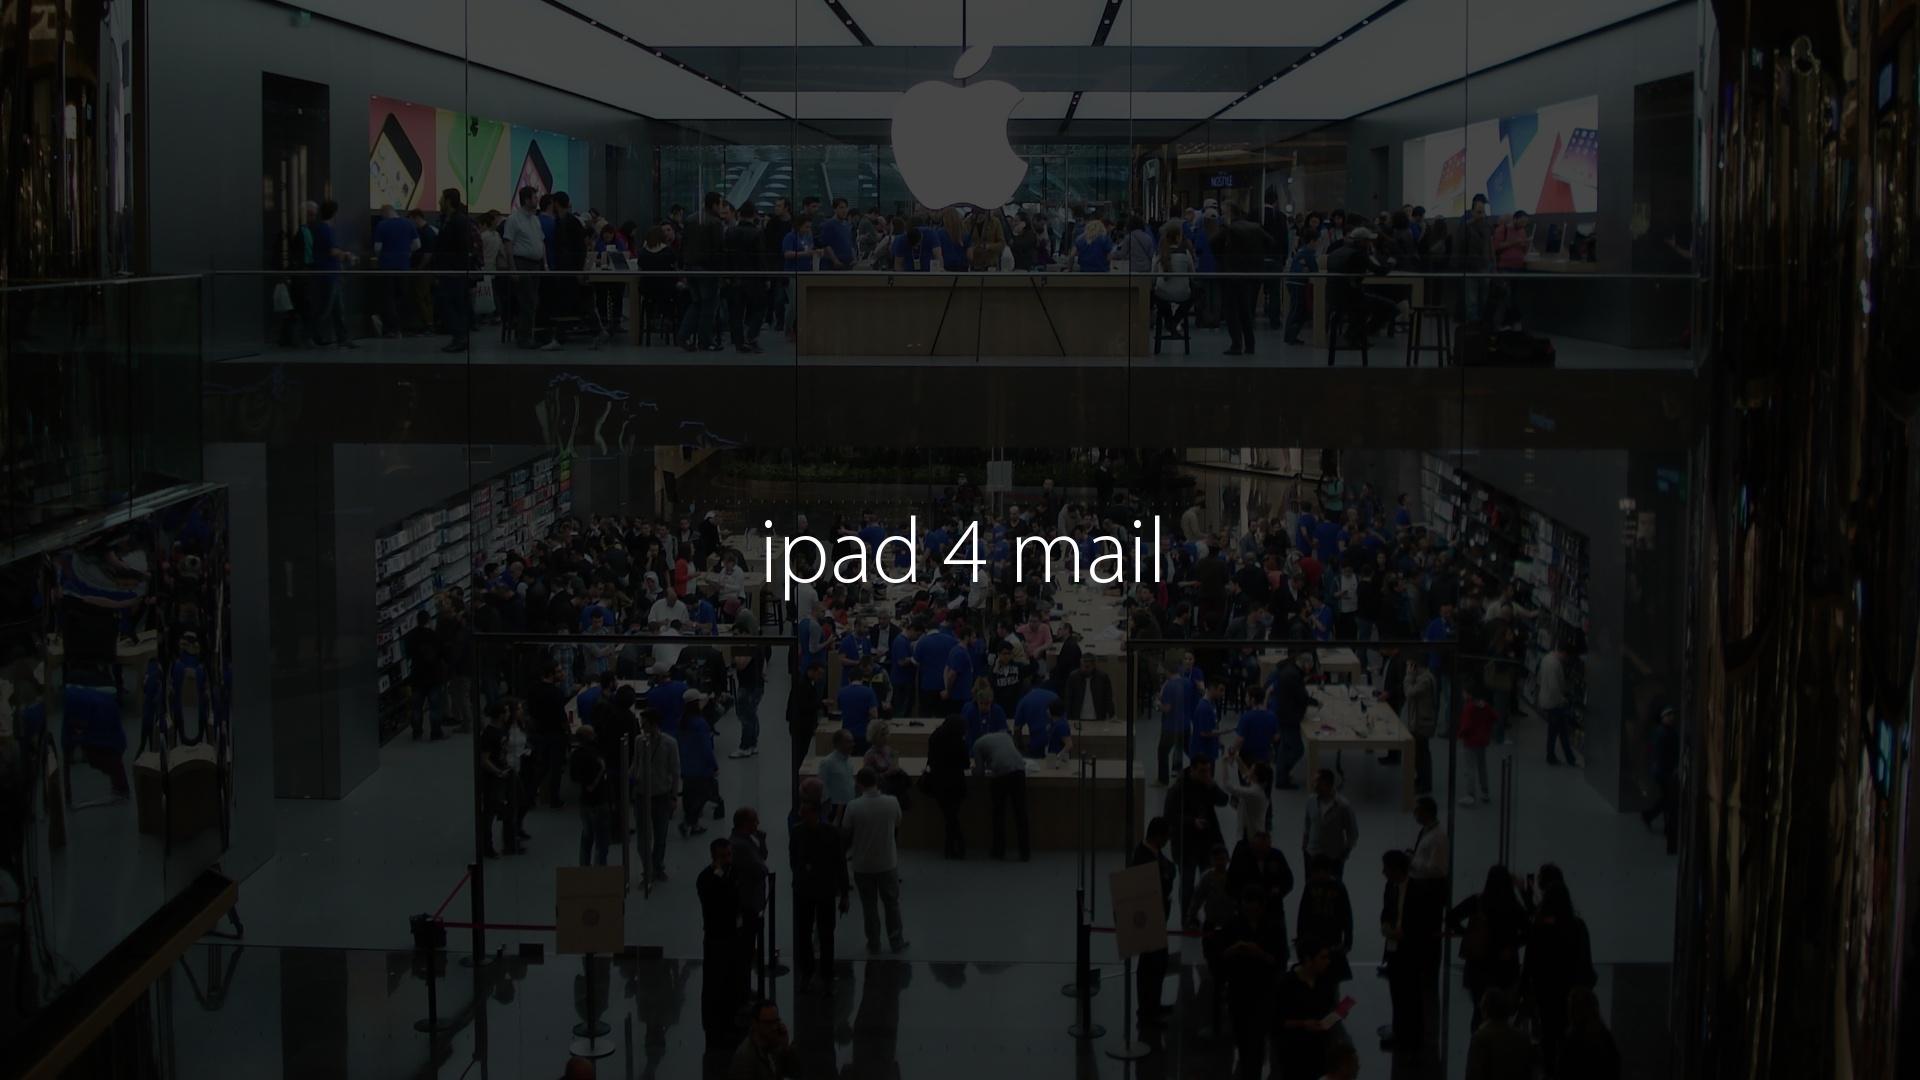 ipad 4 mail